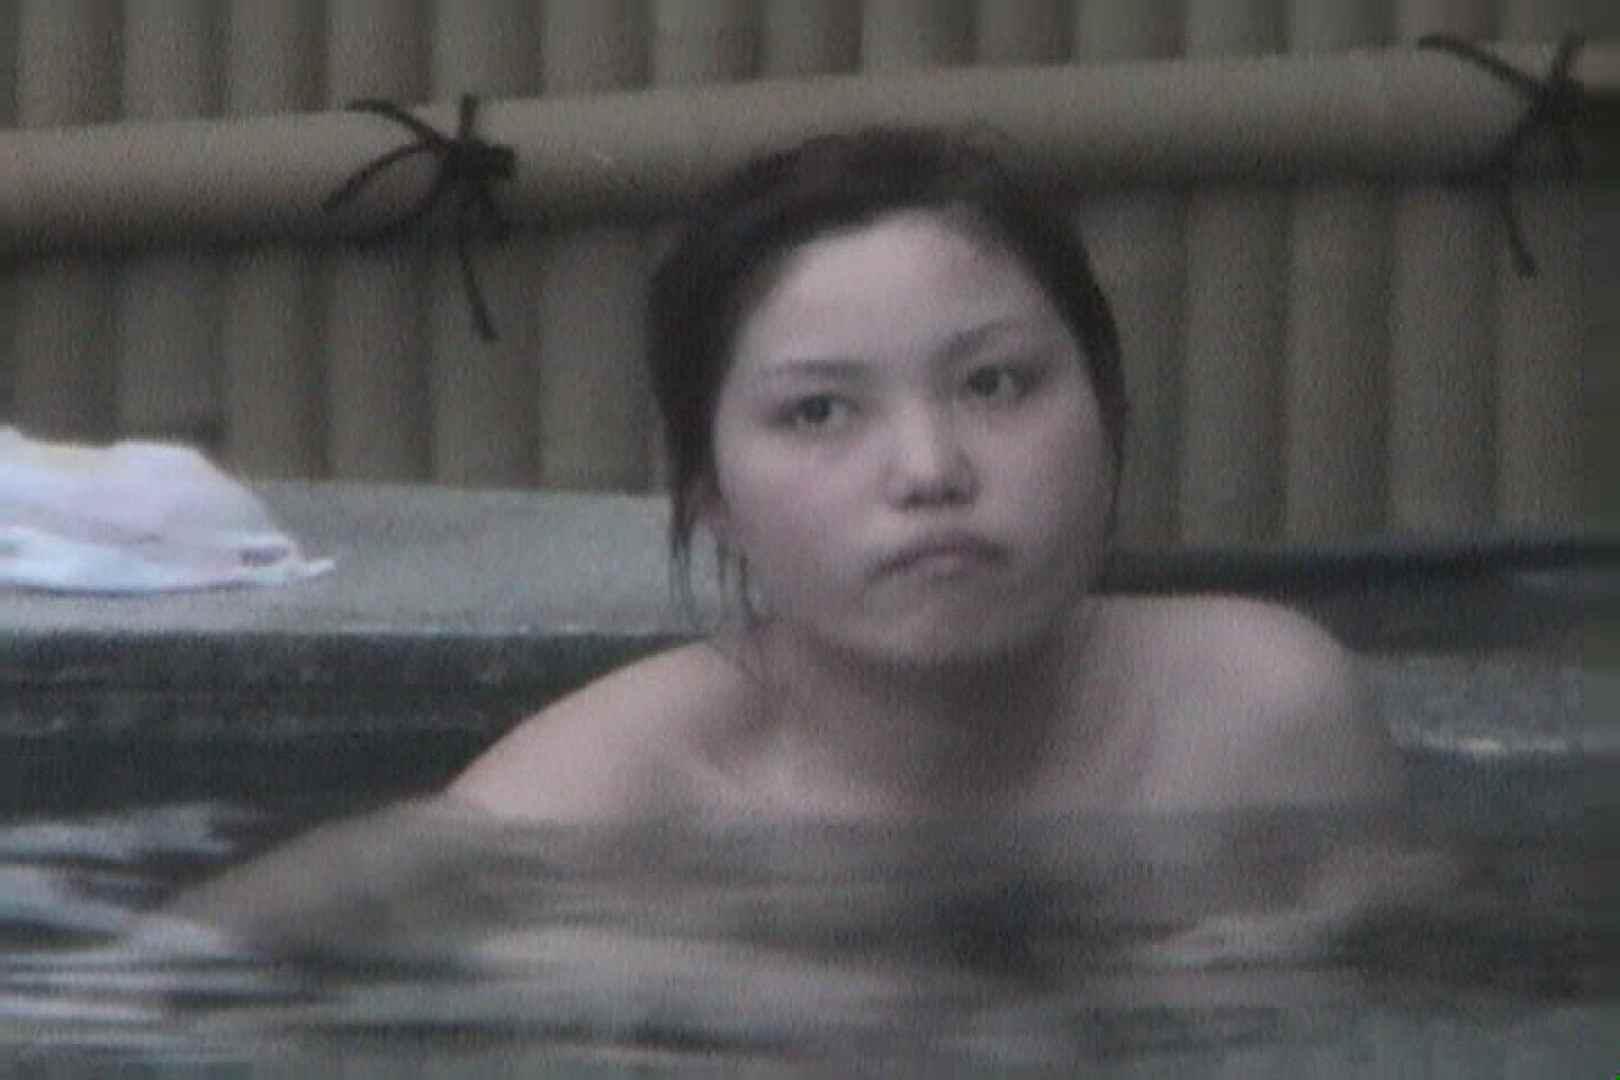 Aquaな露天風呂Vol.602 OLセックス 盗み撮りオマンコ動画キャプチャ 70画像 47